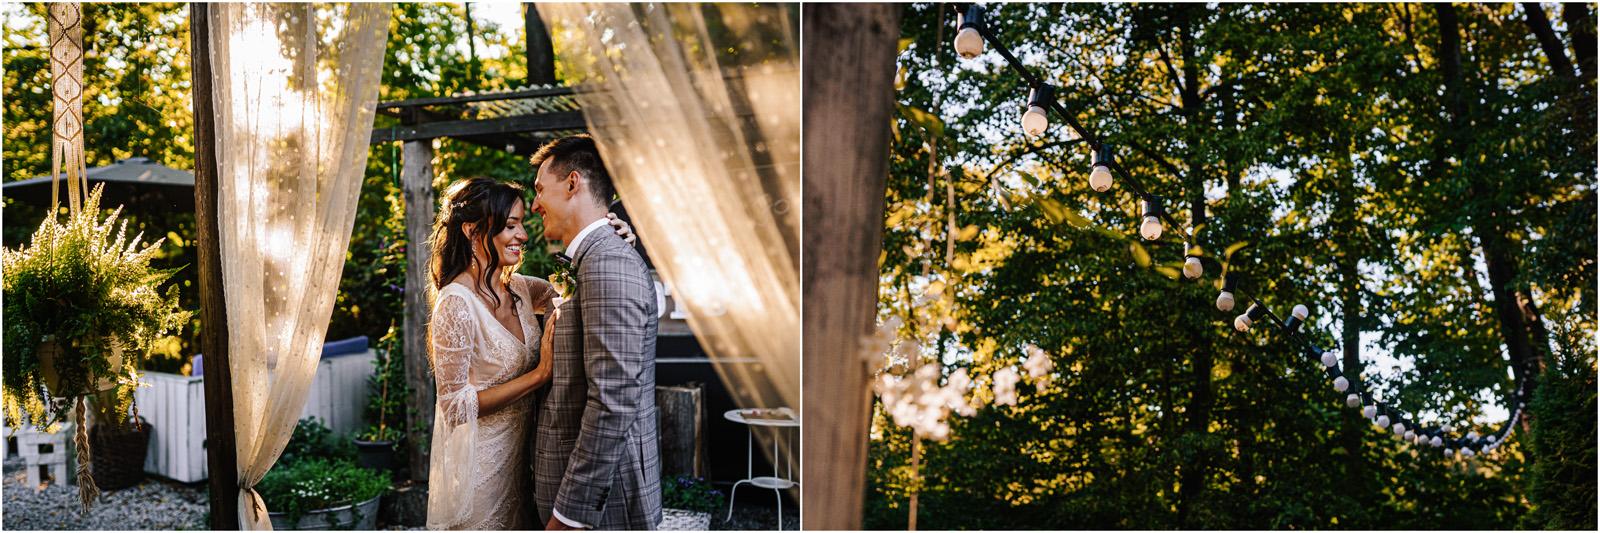 Ania & Mateusz | boho wesele w Stodole pod Kasztanami 88